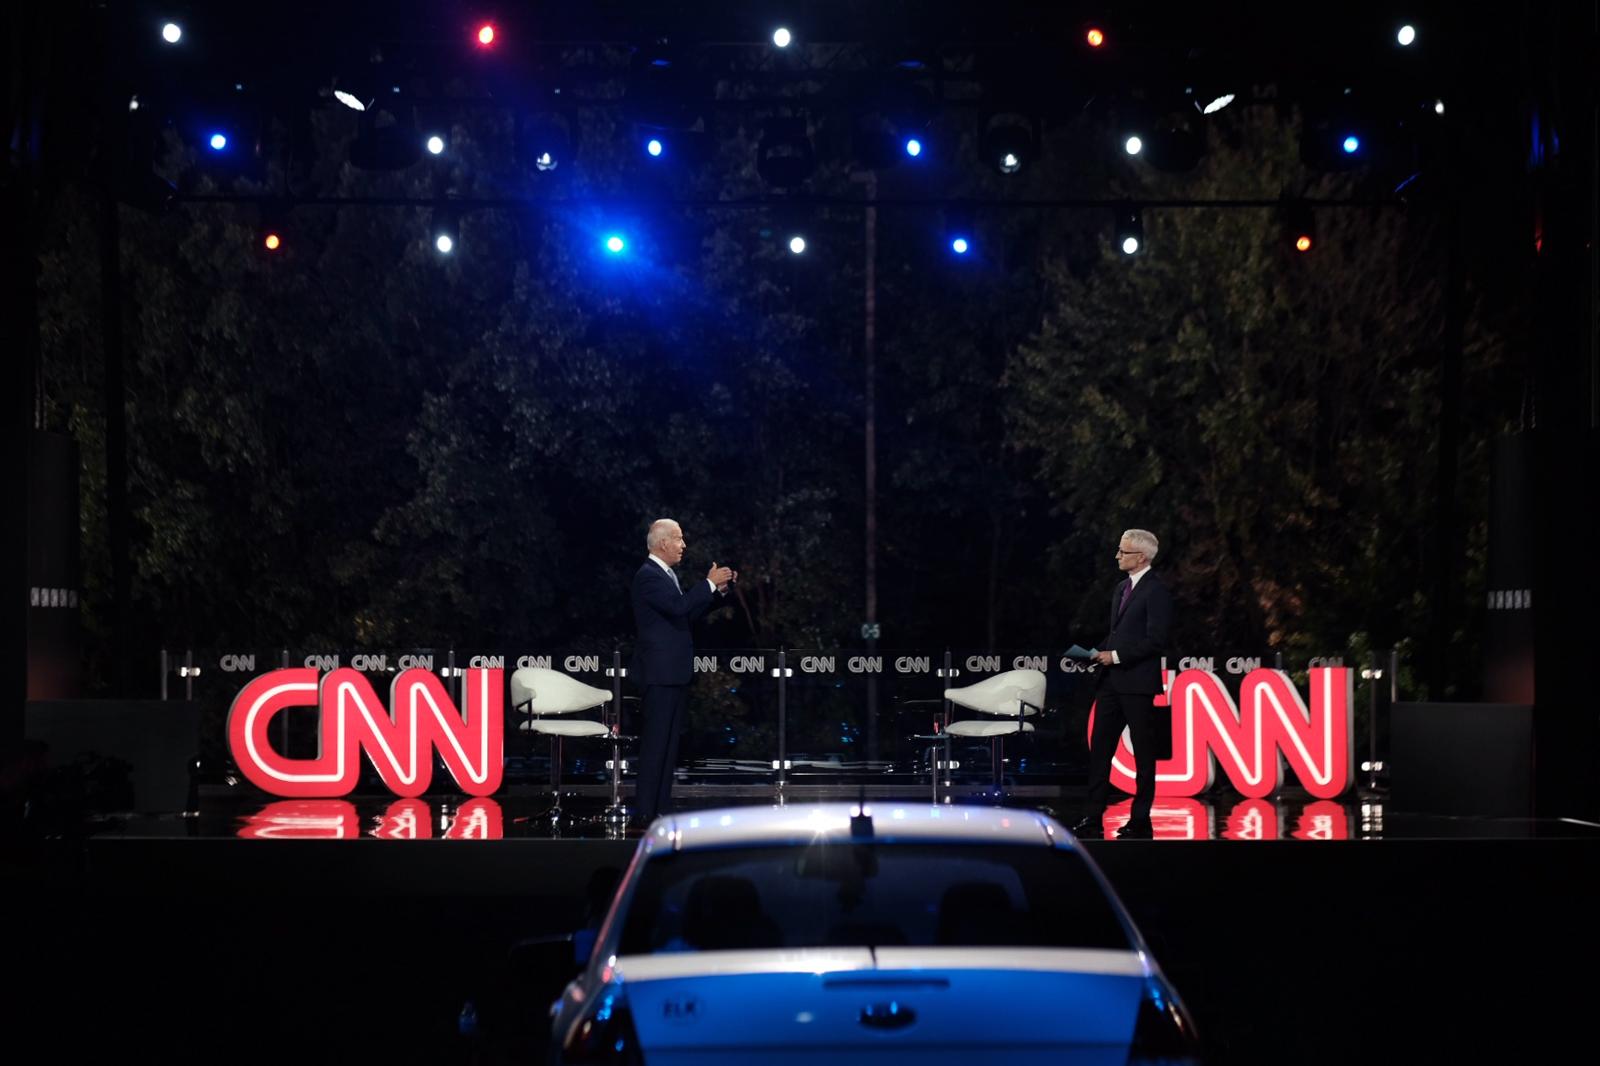 Democratic presidential nominee Joe Biden speaks with CNN's Anderson Cooper at the CNN Presidential Town Hall in Scranton, Pennsylvania, on Thursday, September 17.